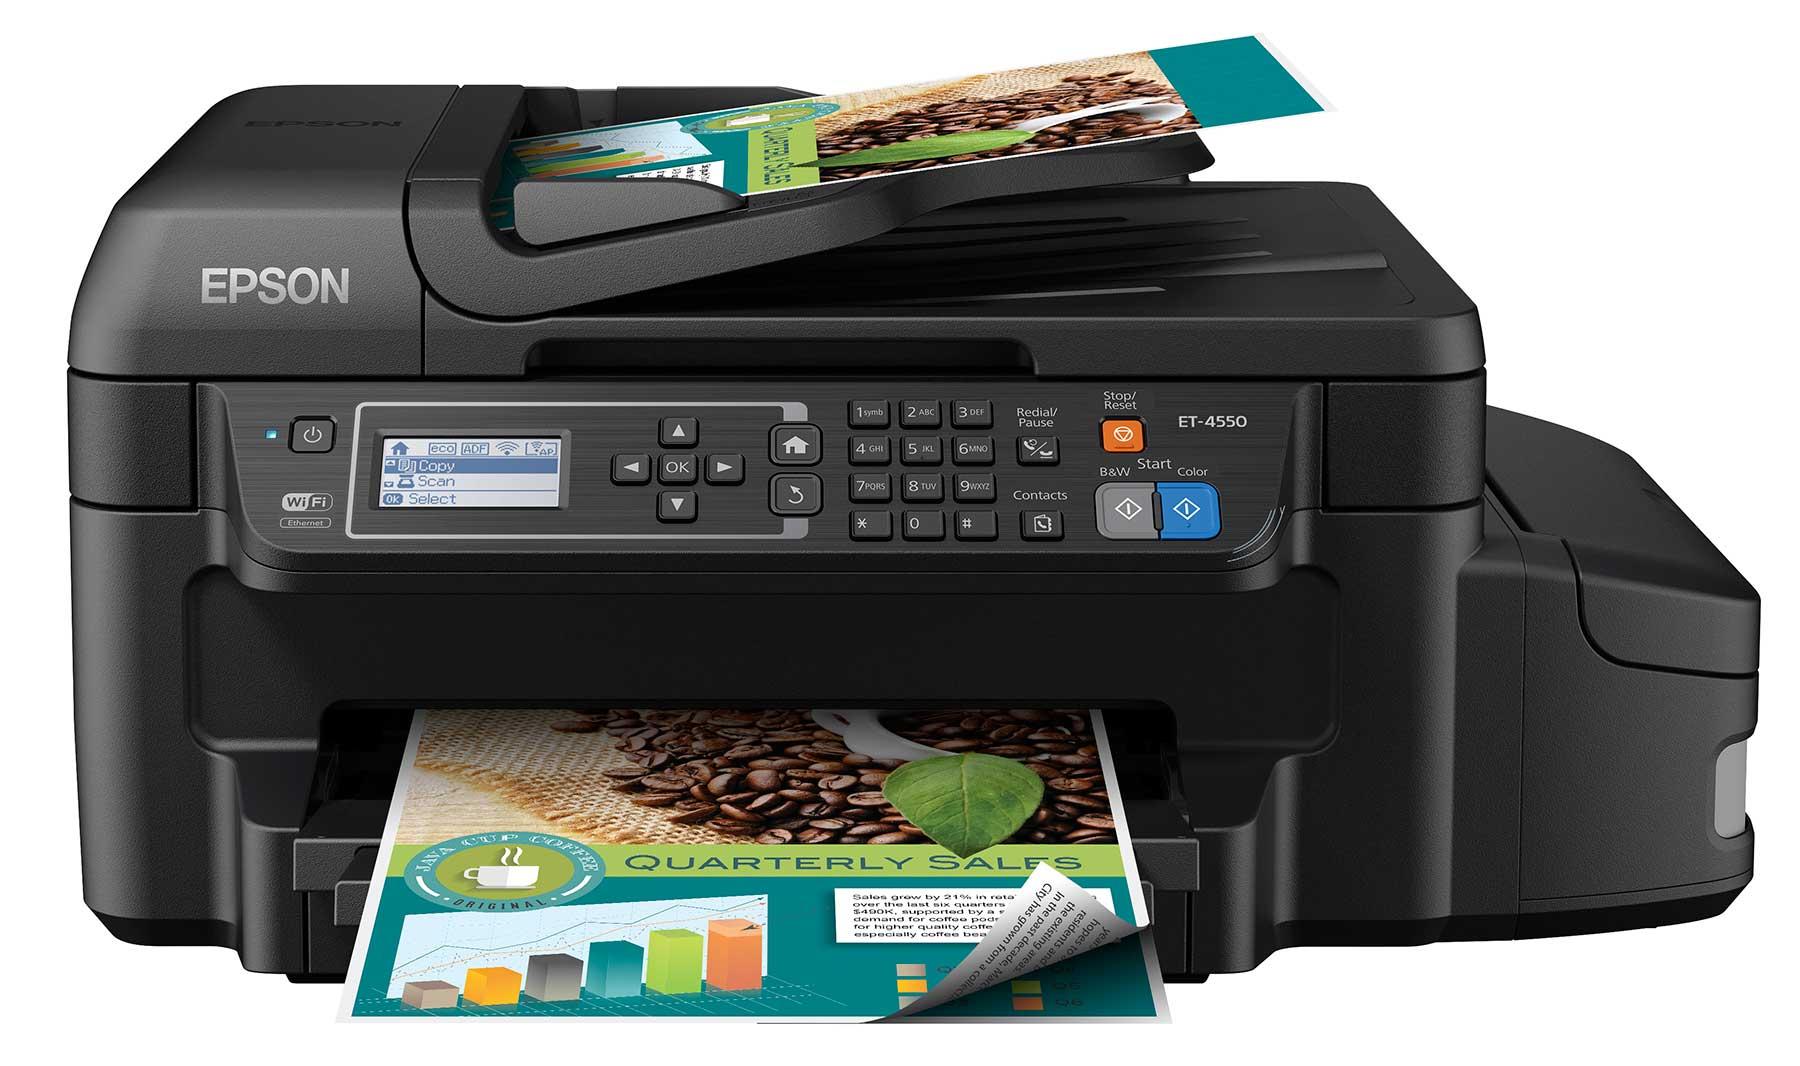 Epson Transforms Printer Category With EcoTank